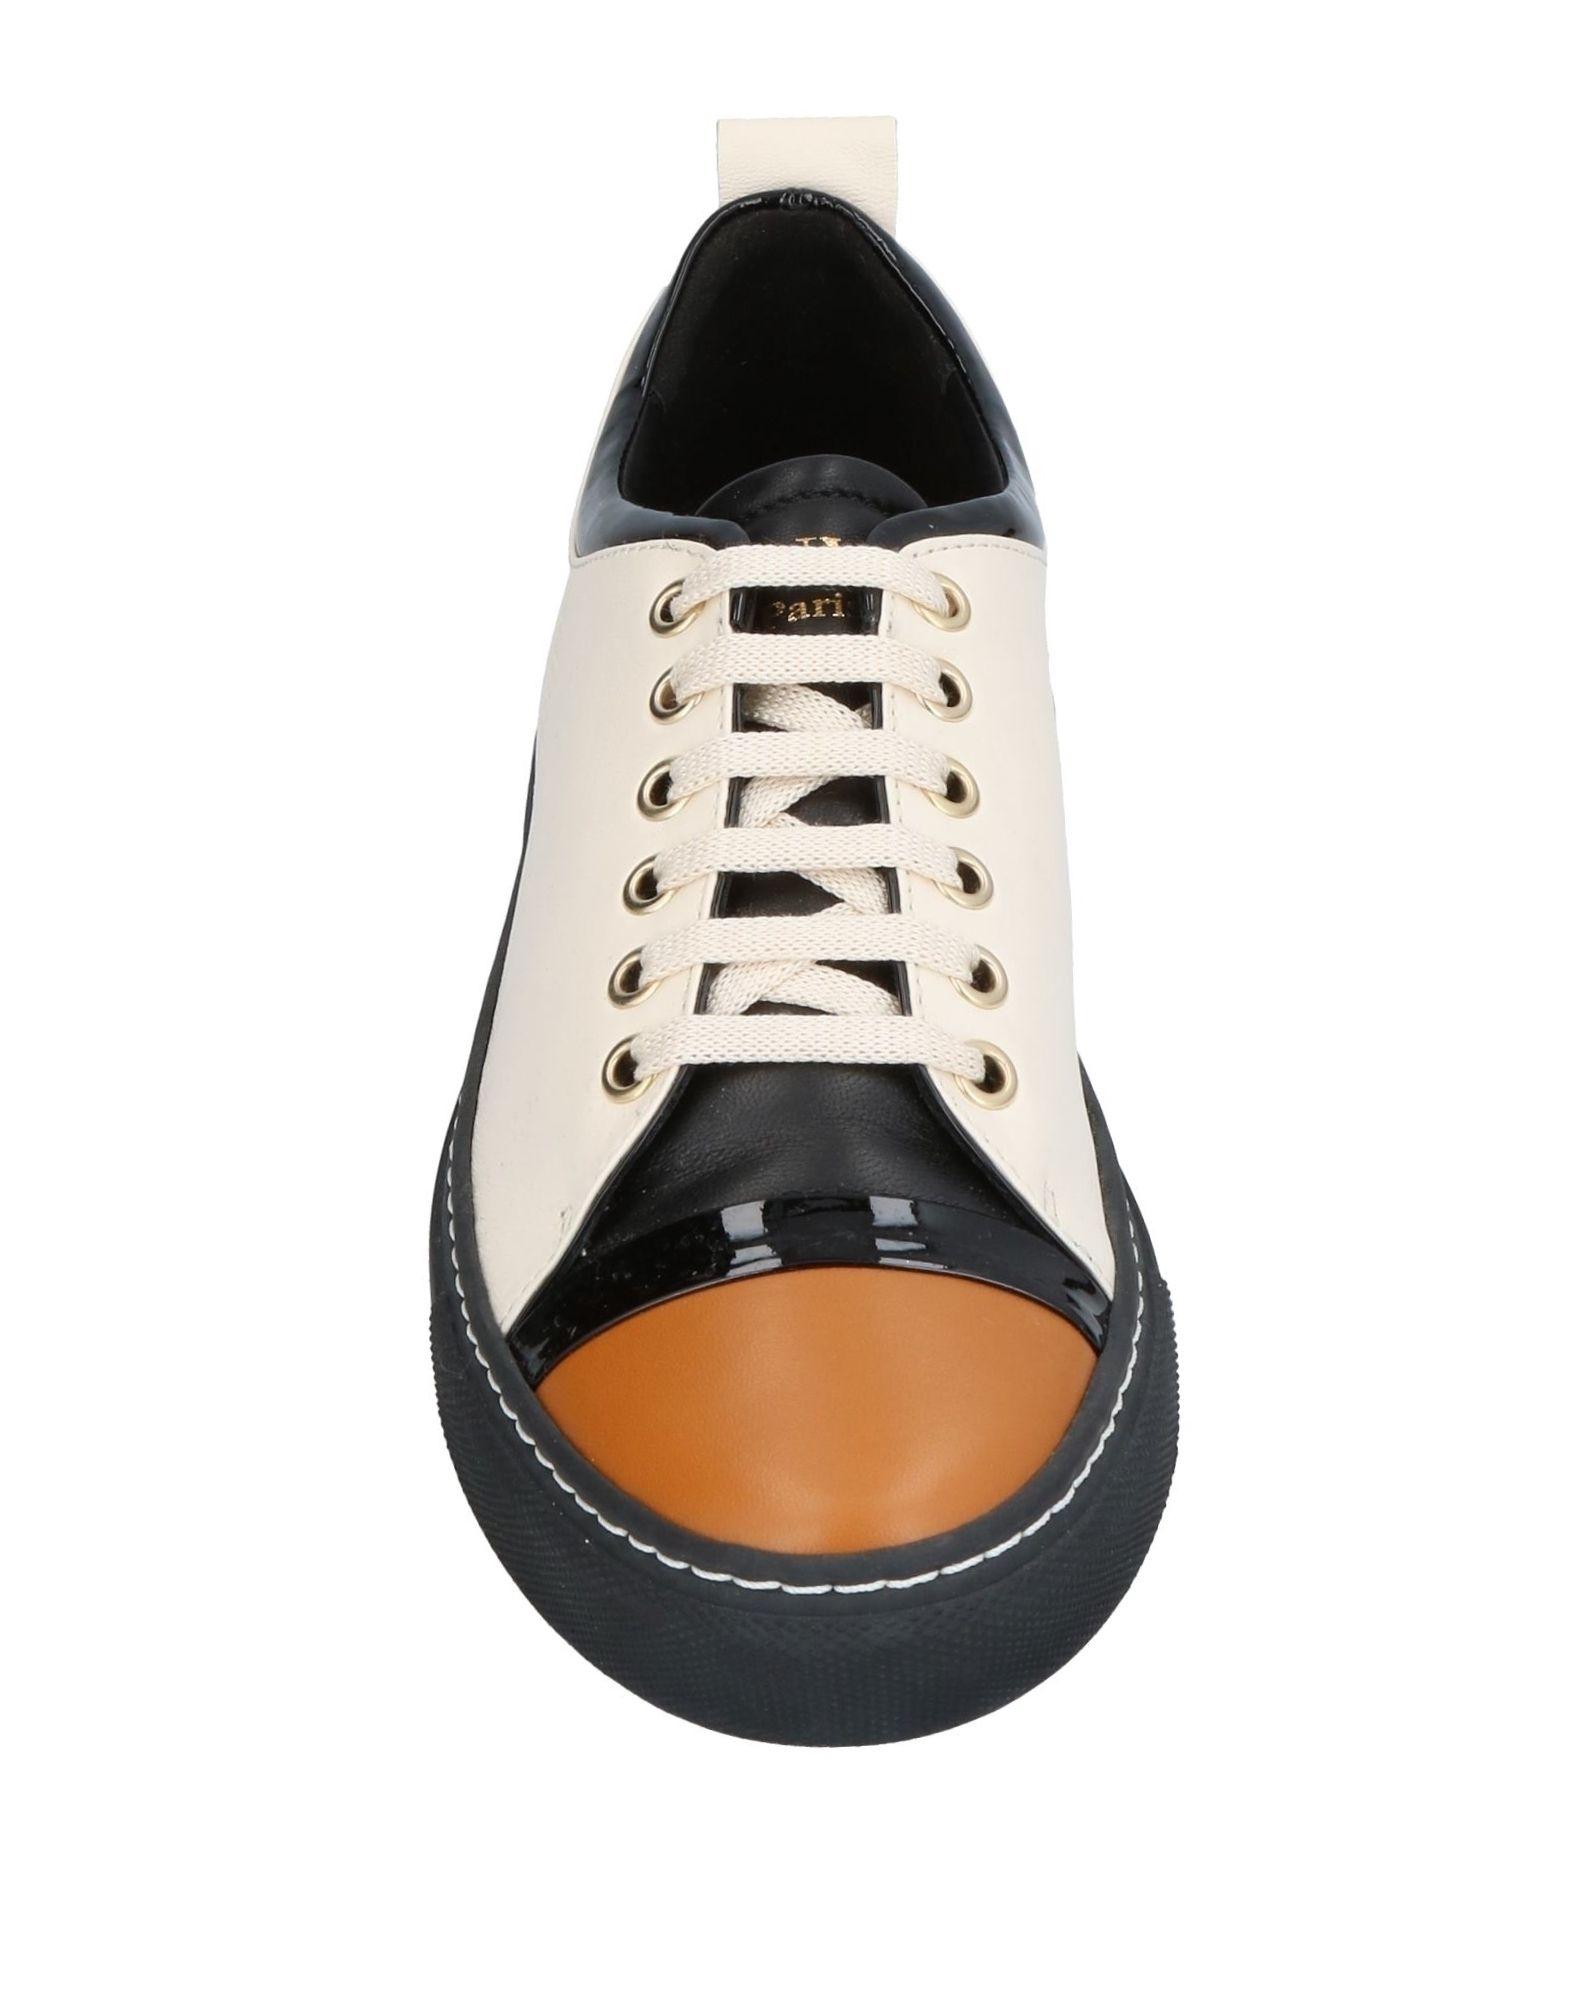 Rabatt Schuhe Lanvin Sneakers  Damen  Sneakers 11381020TI 4fe42f